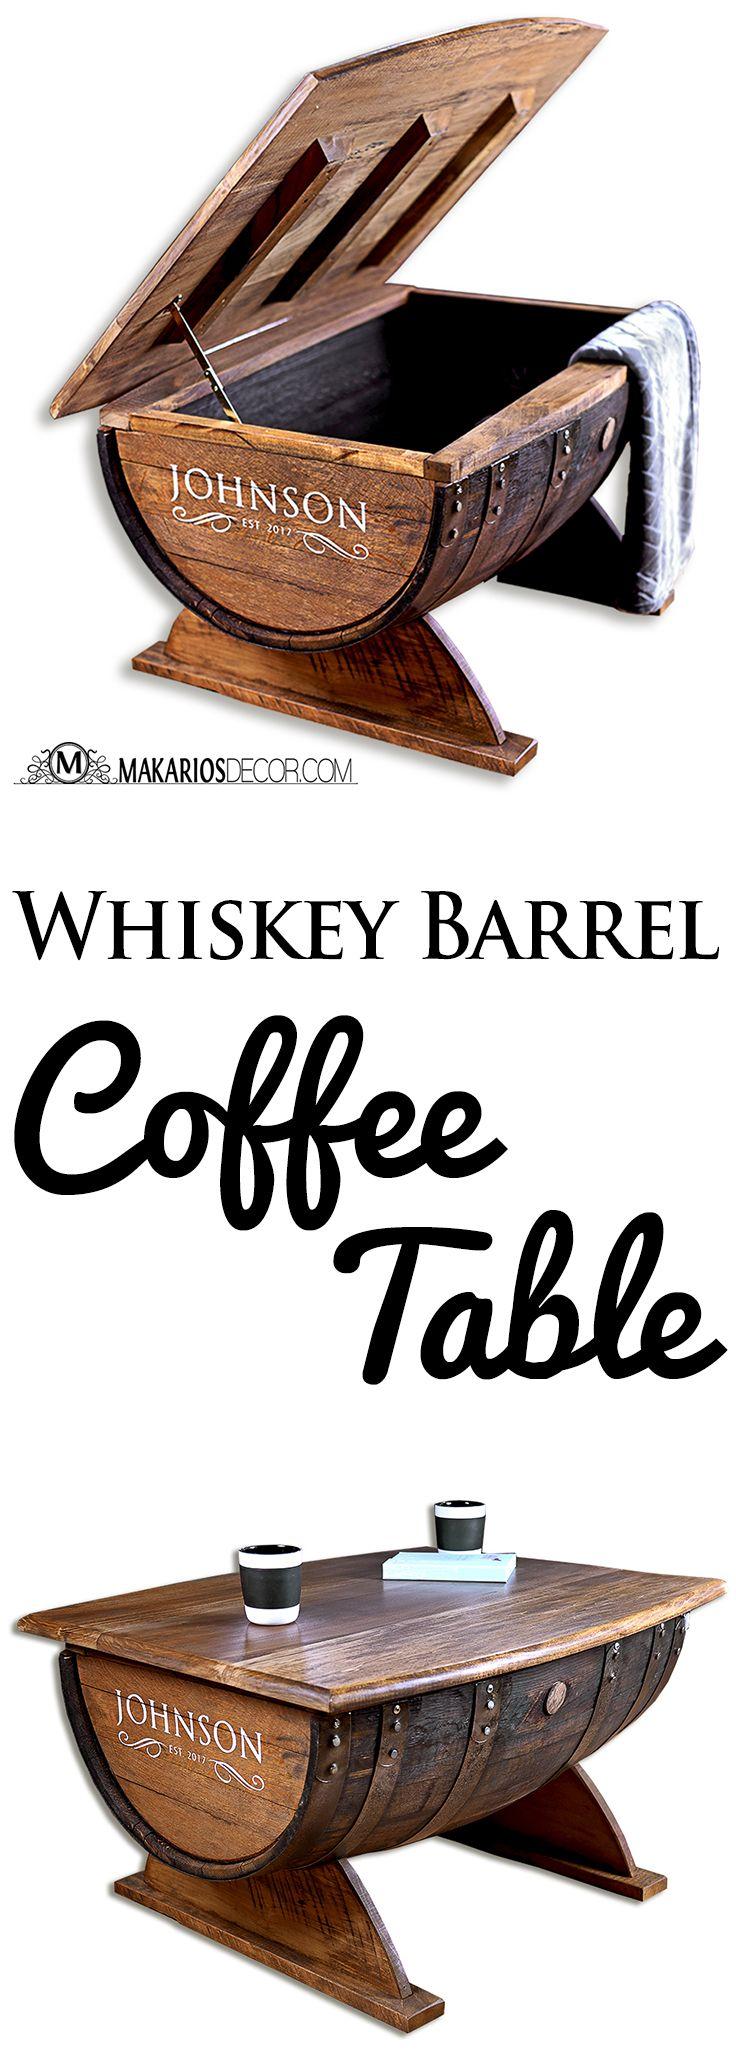 a52da94618ae8f3d137c9904231b3b29 Whiskey Barrel Coffee Table Wine Barrel Distressed Finish Coffee Table